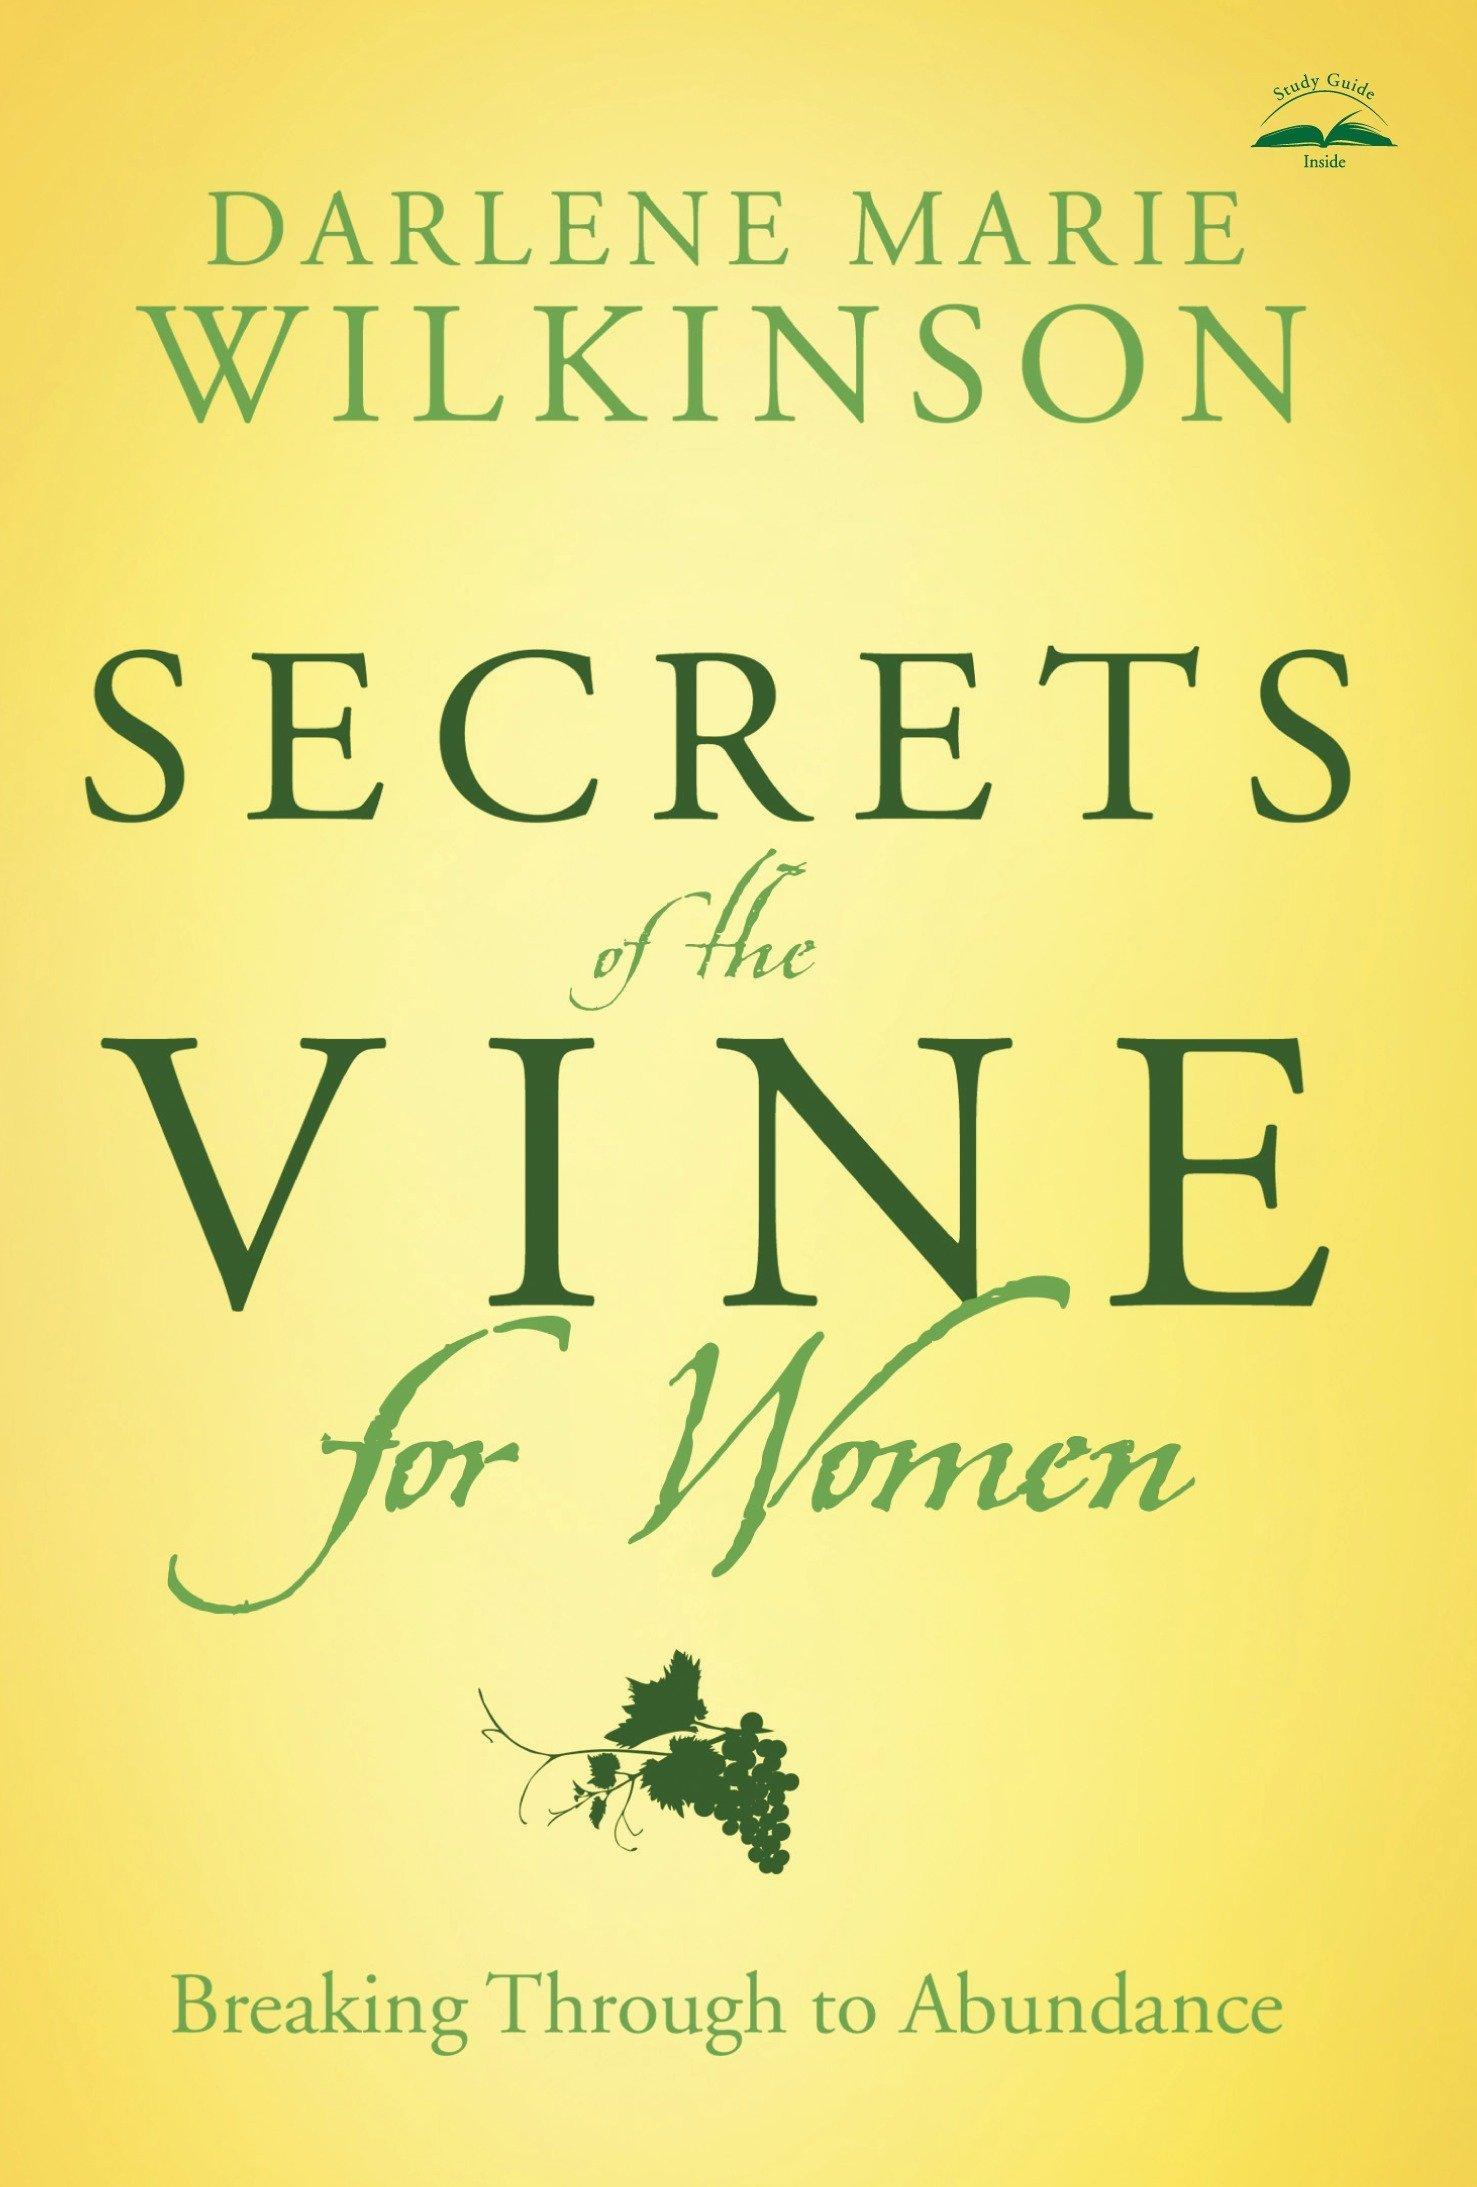 Download Secrets of the Vine for Women: Breaking Through to Abundance (Breakthrough Series) PDF